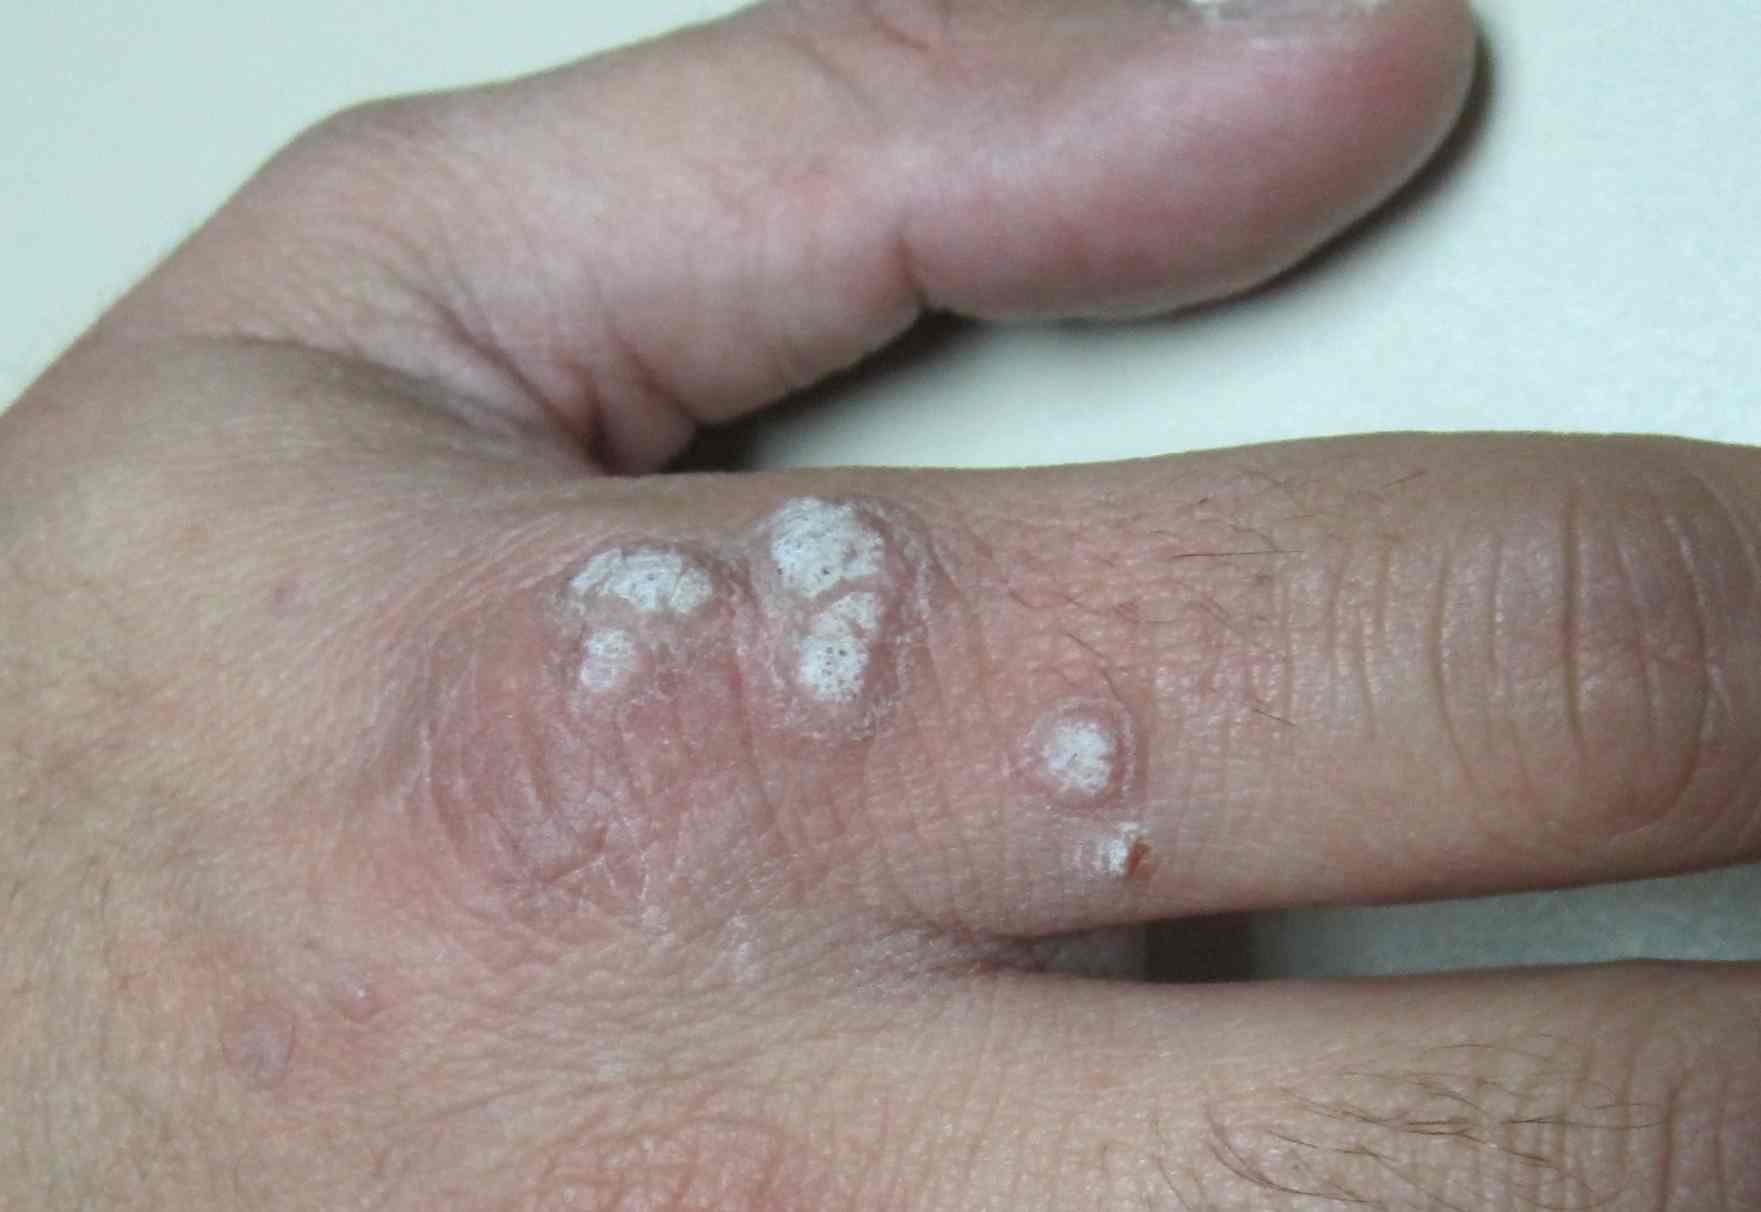 genital warts without hpv virus